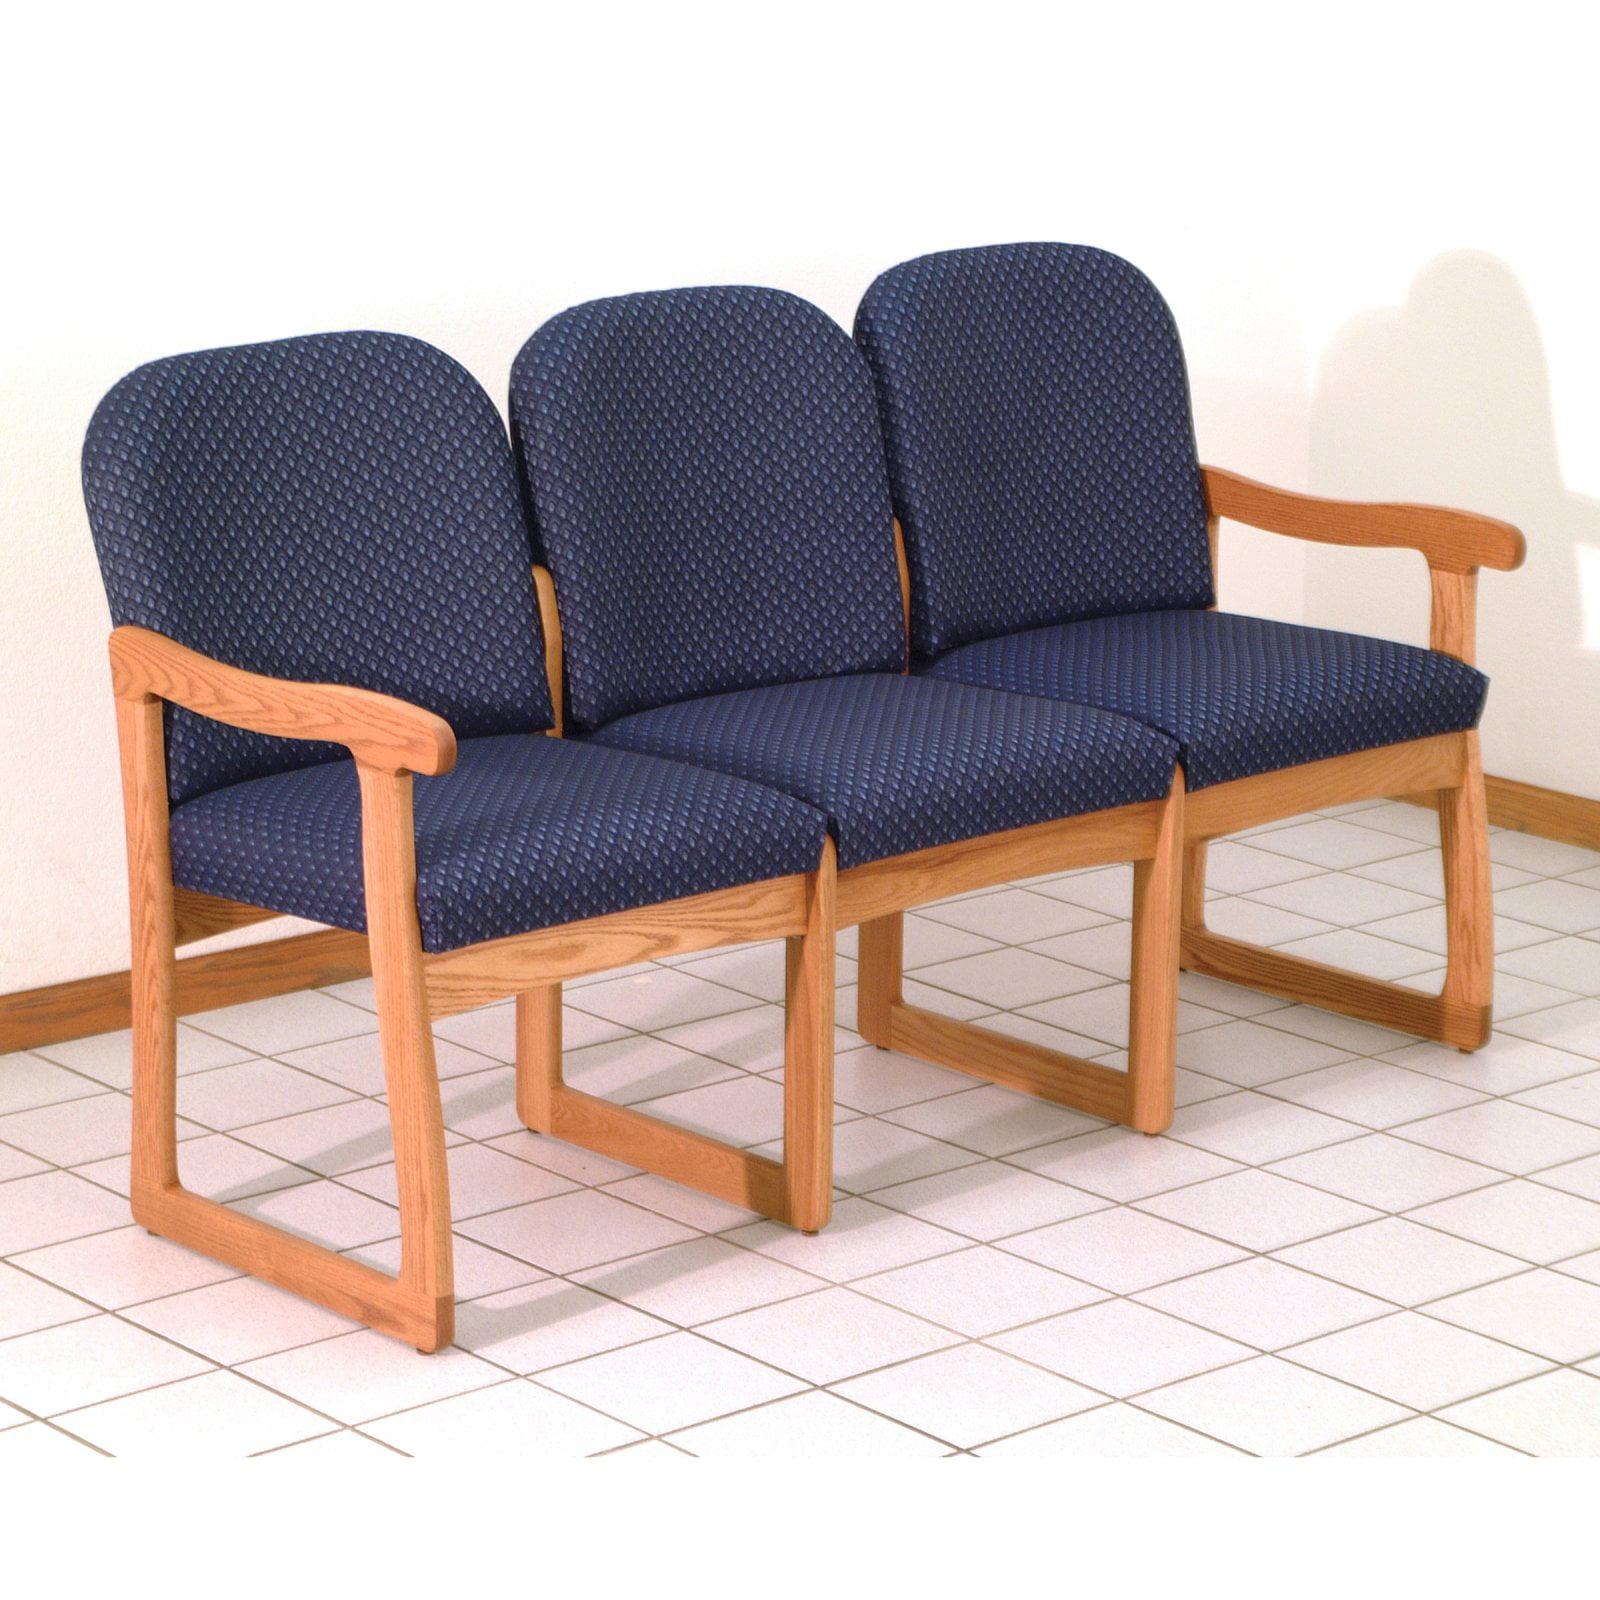 Wooden Mallet DW8-3 Solid Oak 3-Seat Sofa